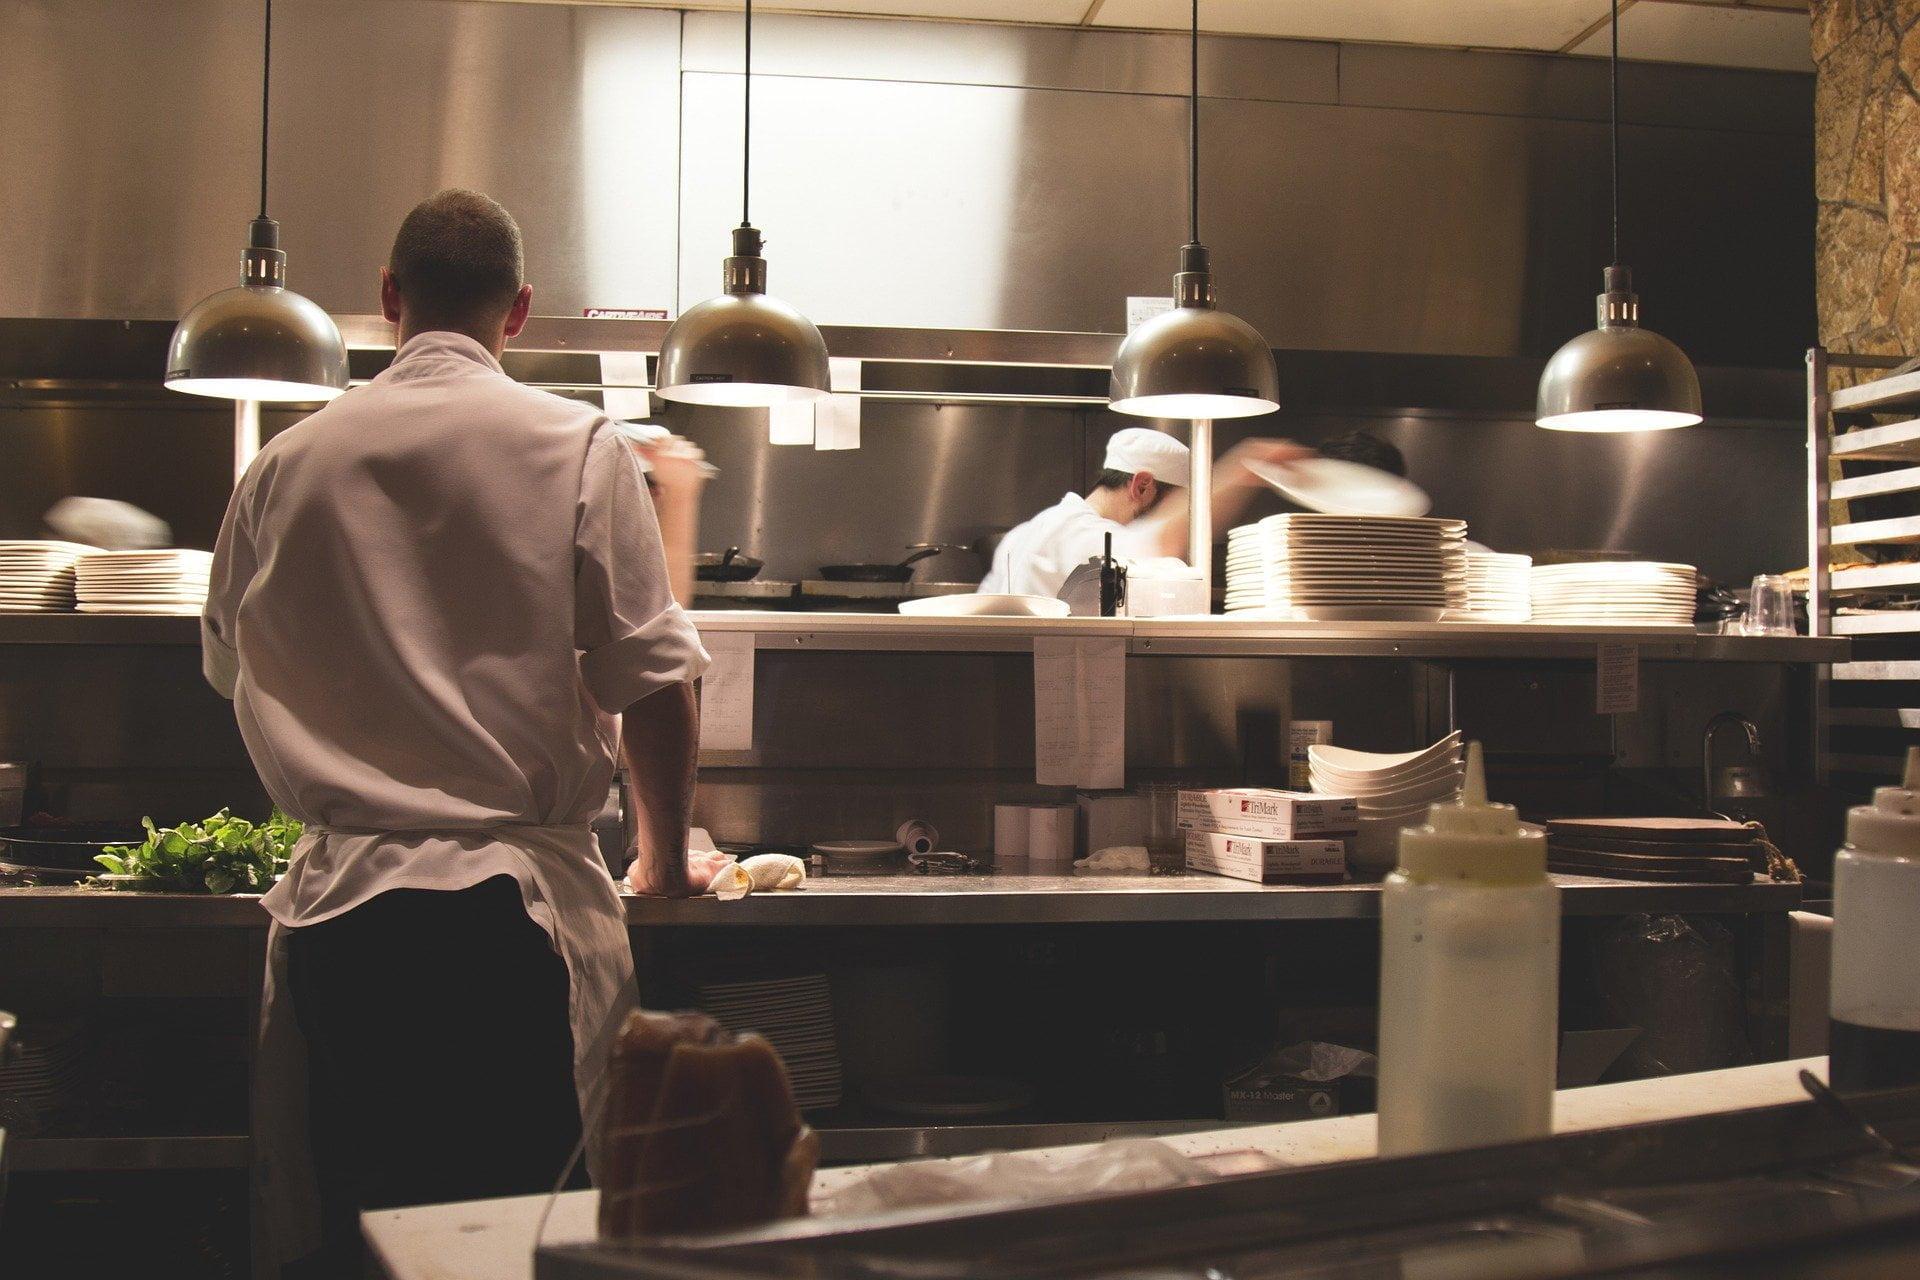 restauracja, biznes, kuchnia